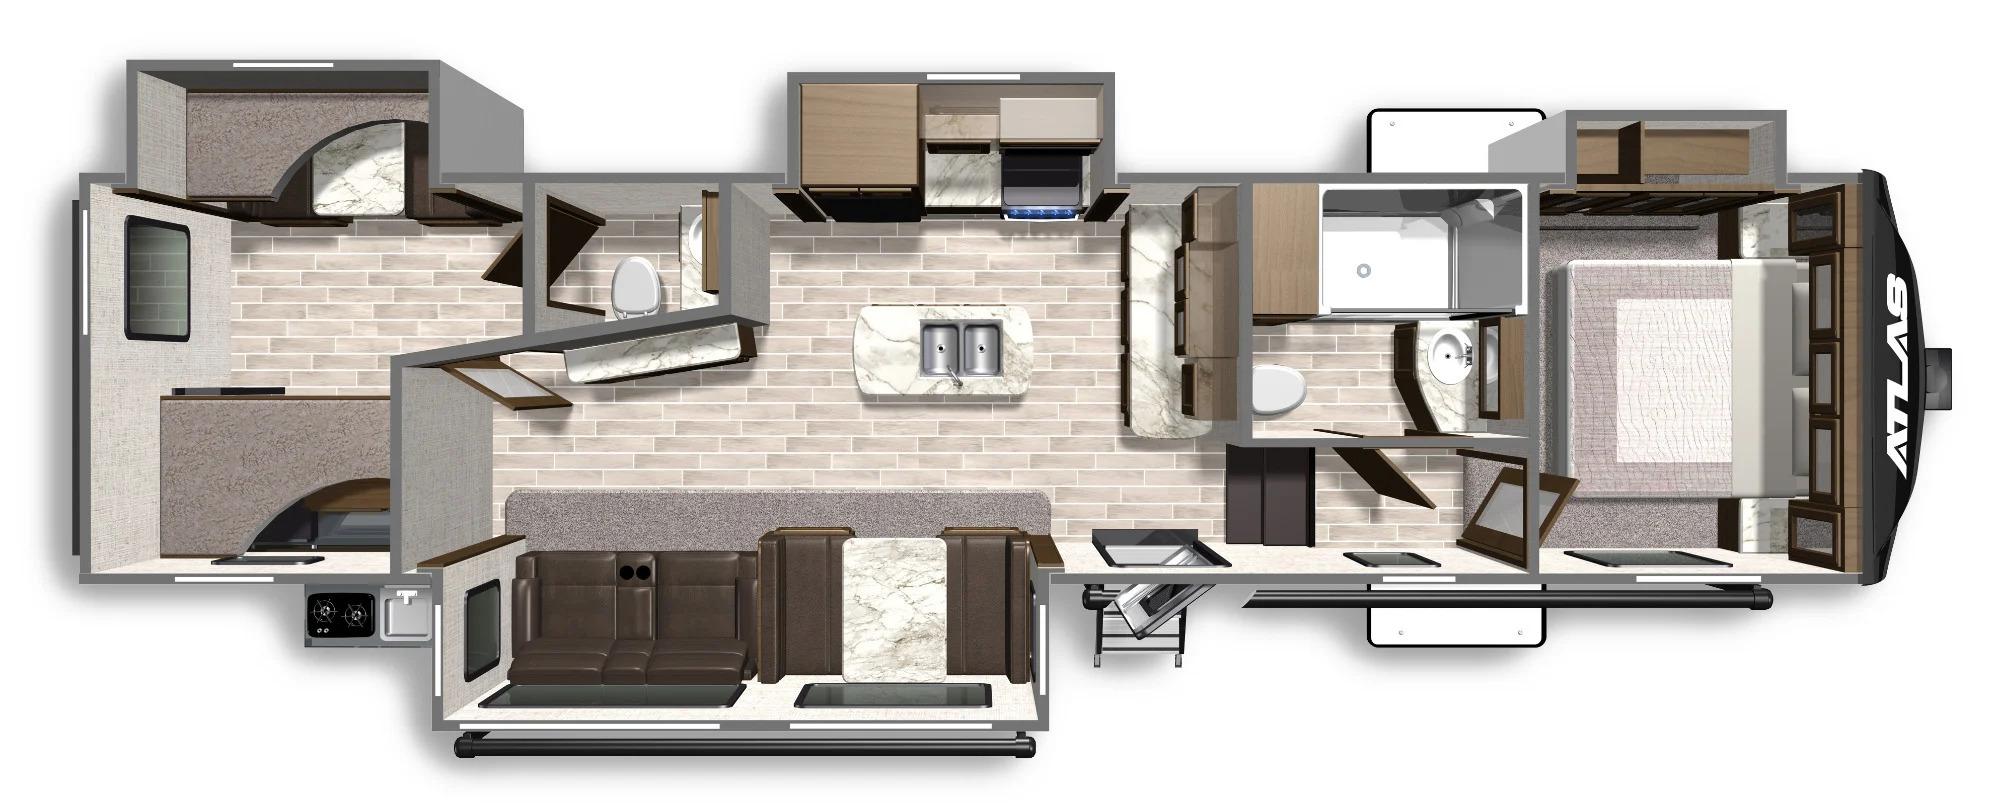 View Floor Plan for 2022 DUTCHMEN ATLAS 3342BHF